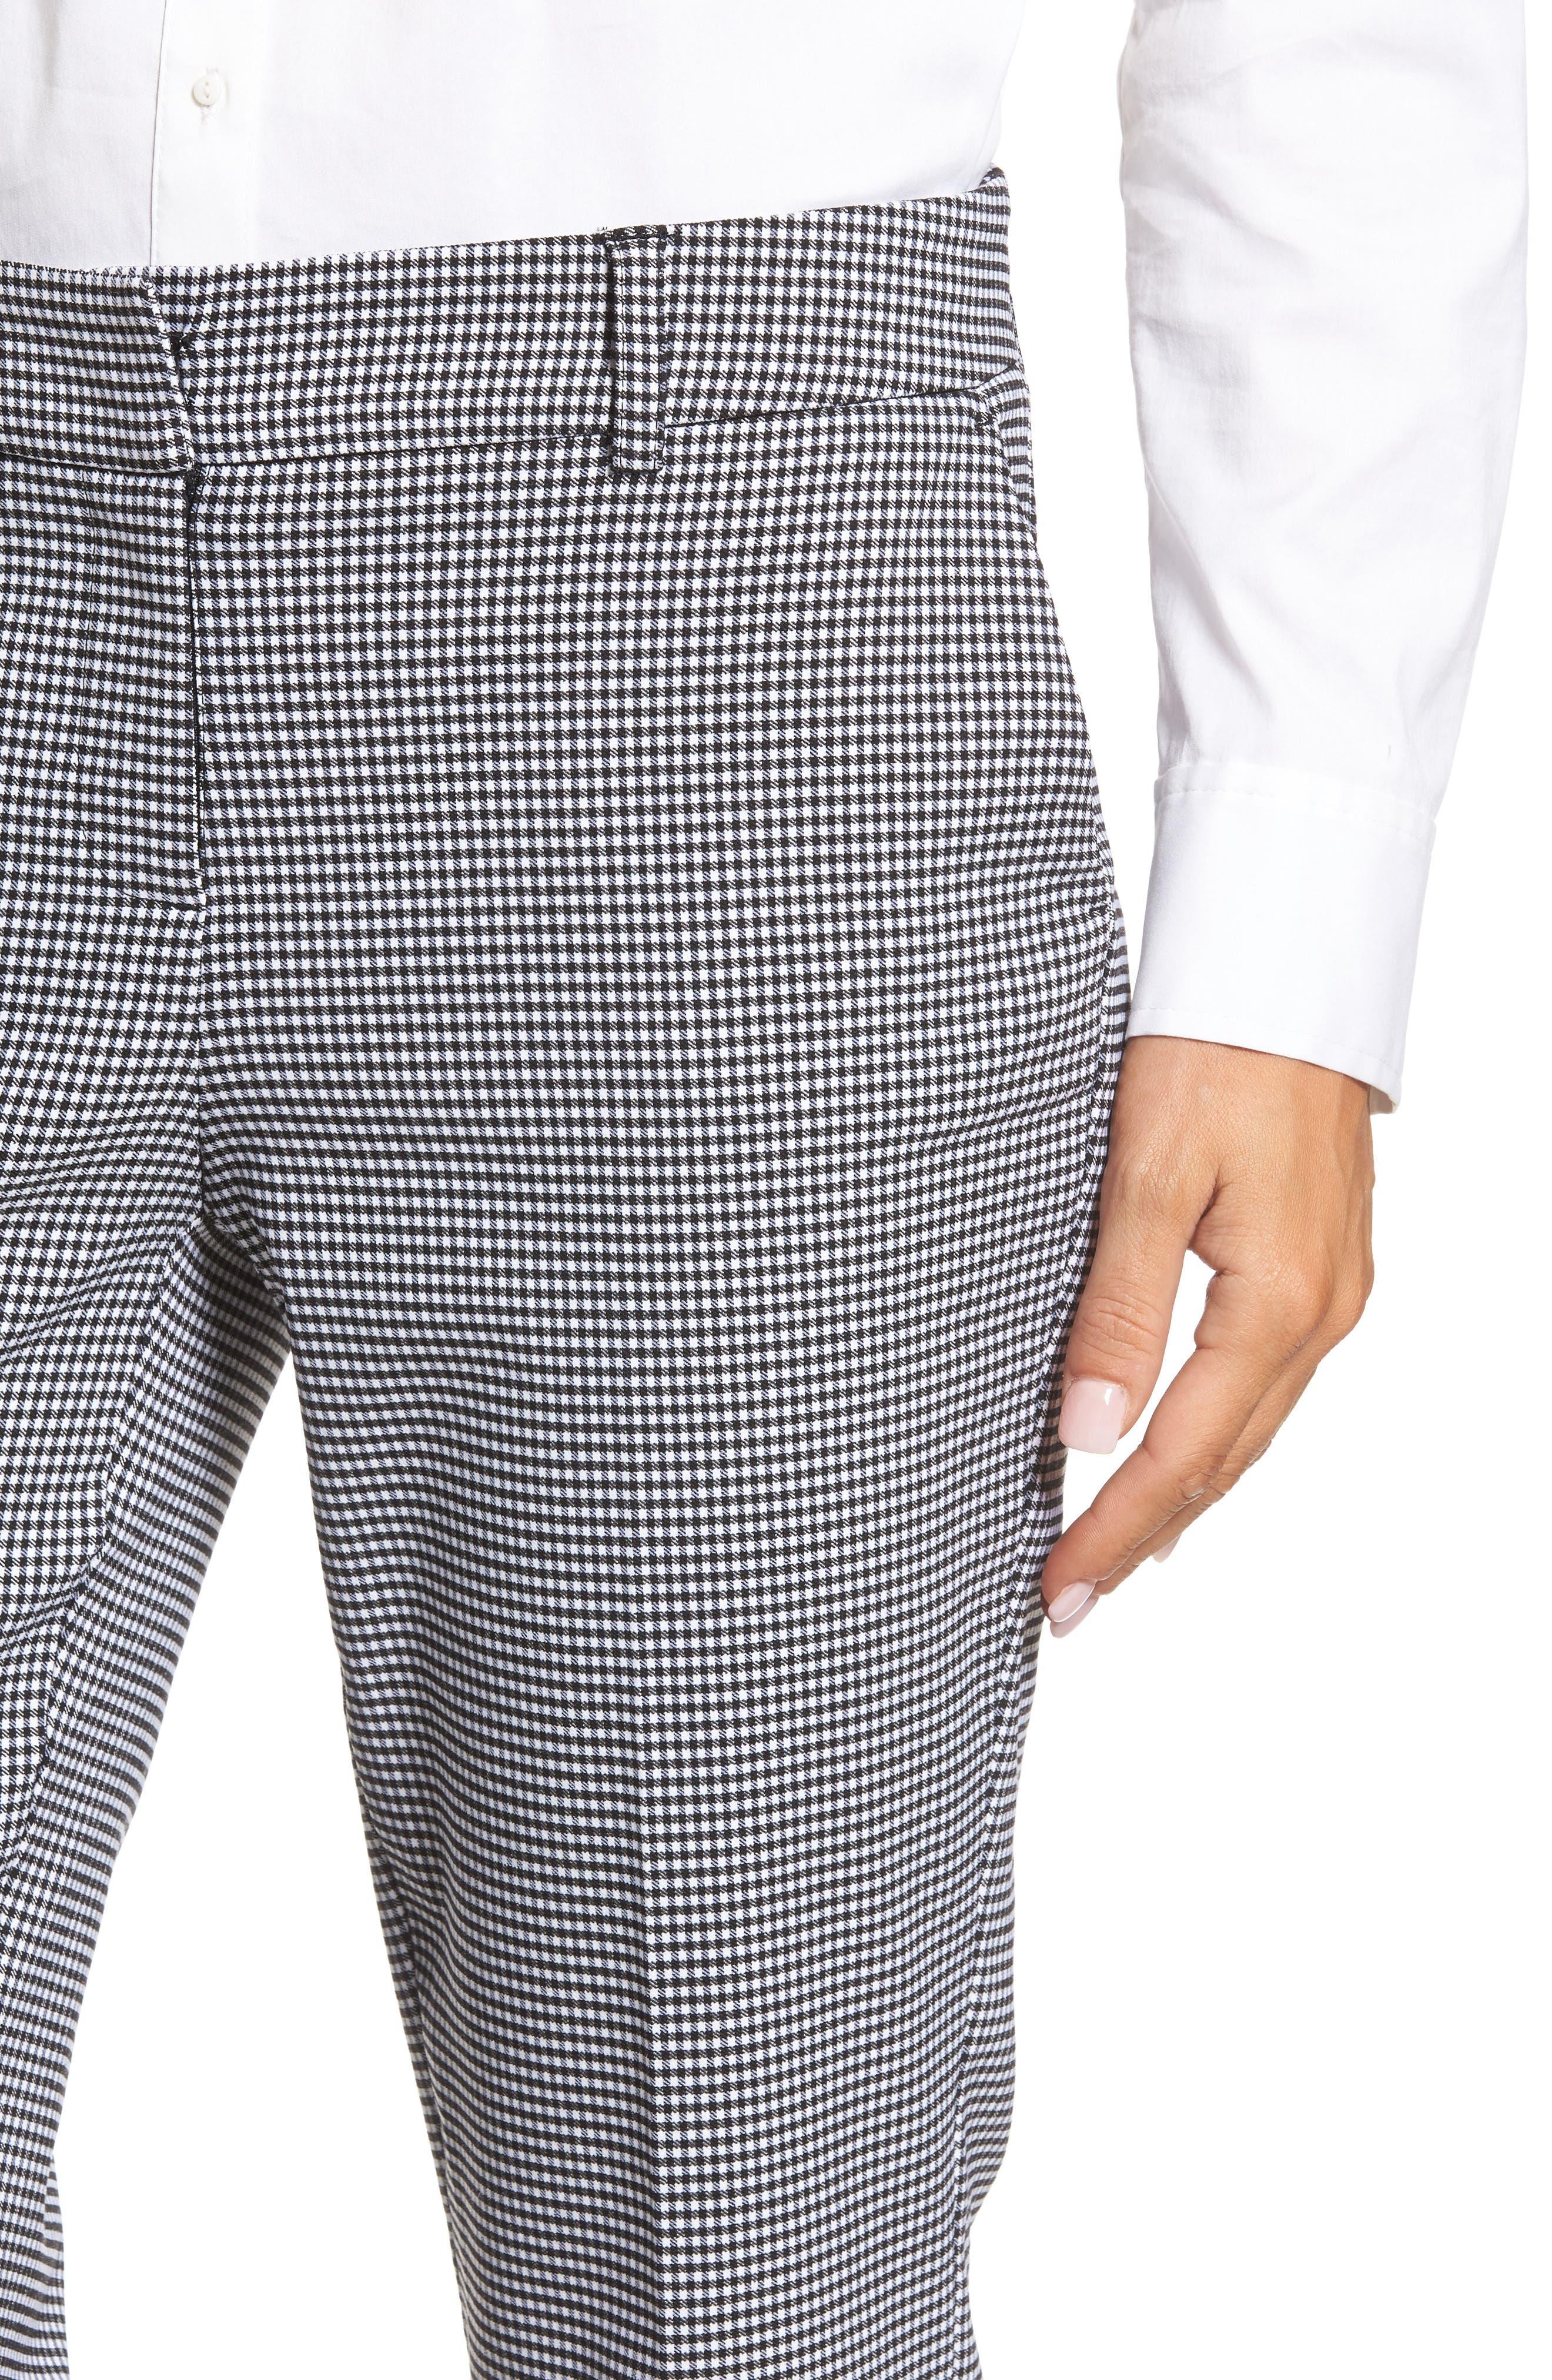 Crop Stretch Cotton Pants,                             Alternate thumbnail 6, color,                             Black- White Gingham